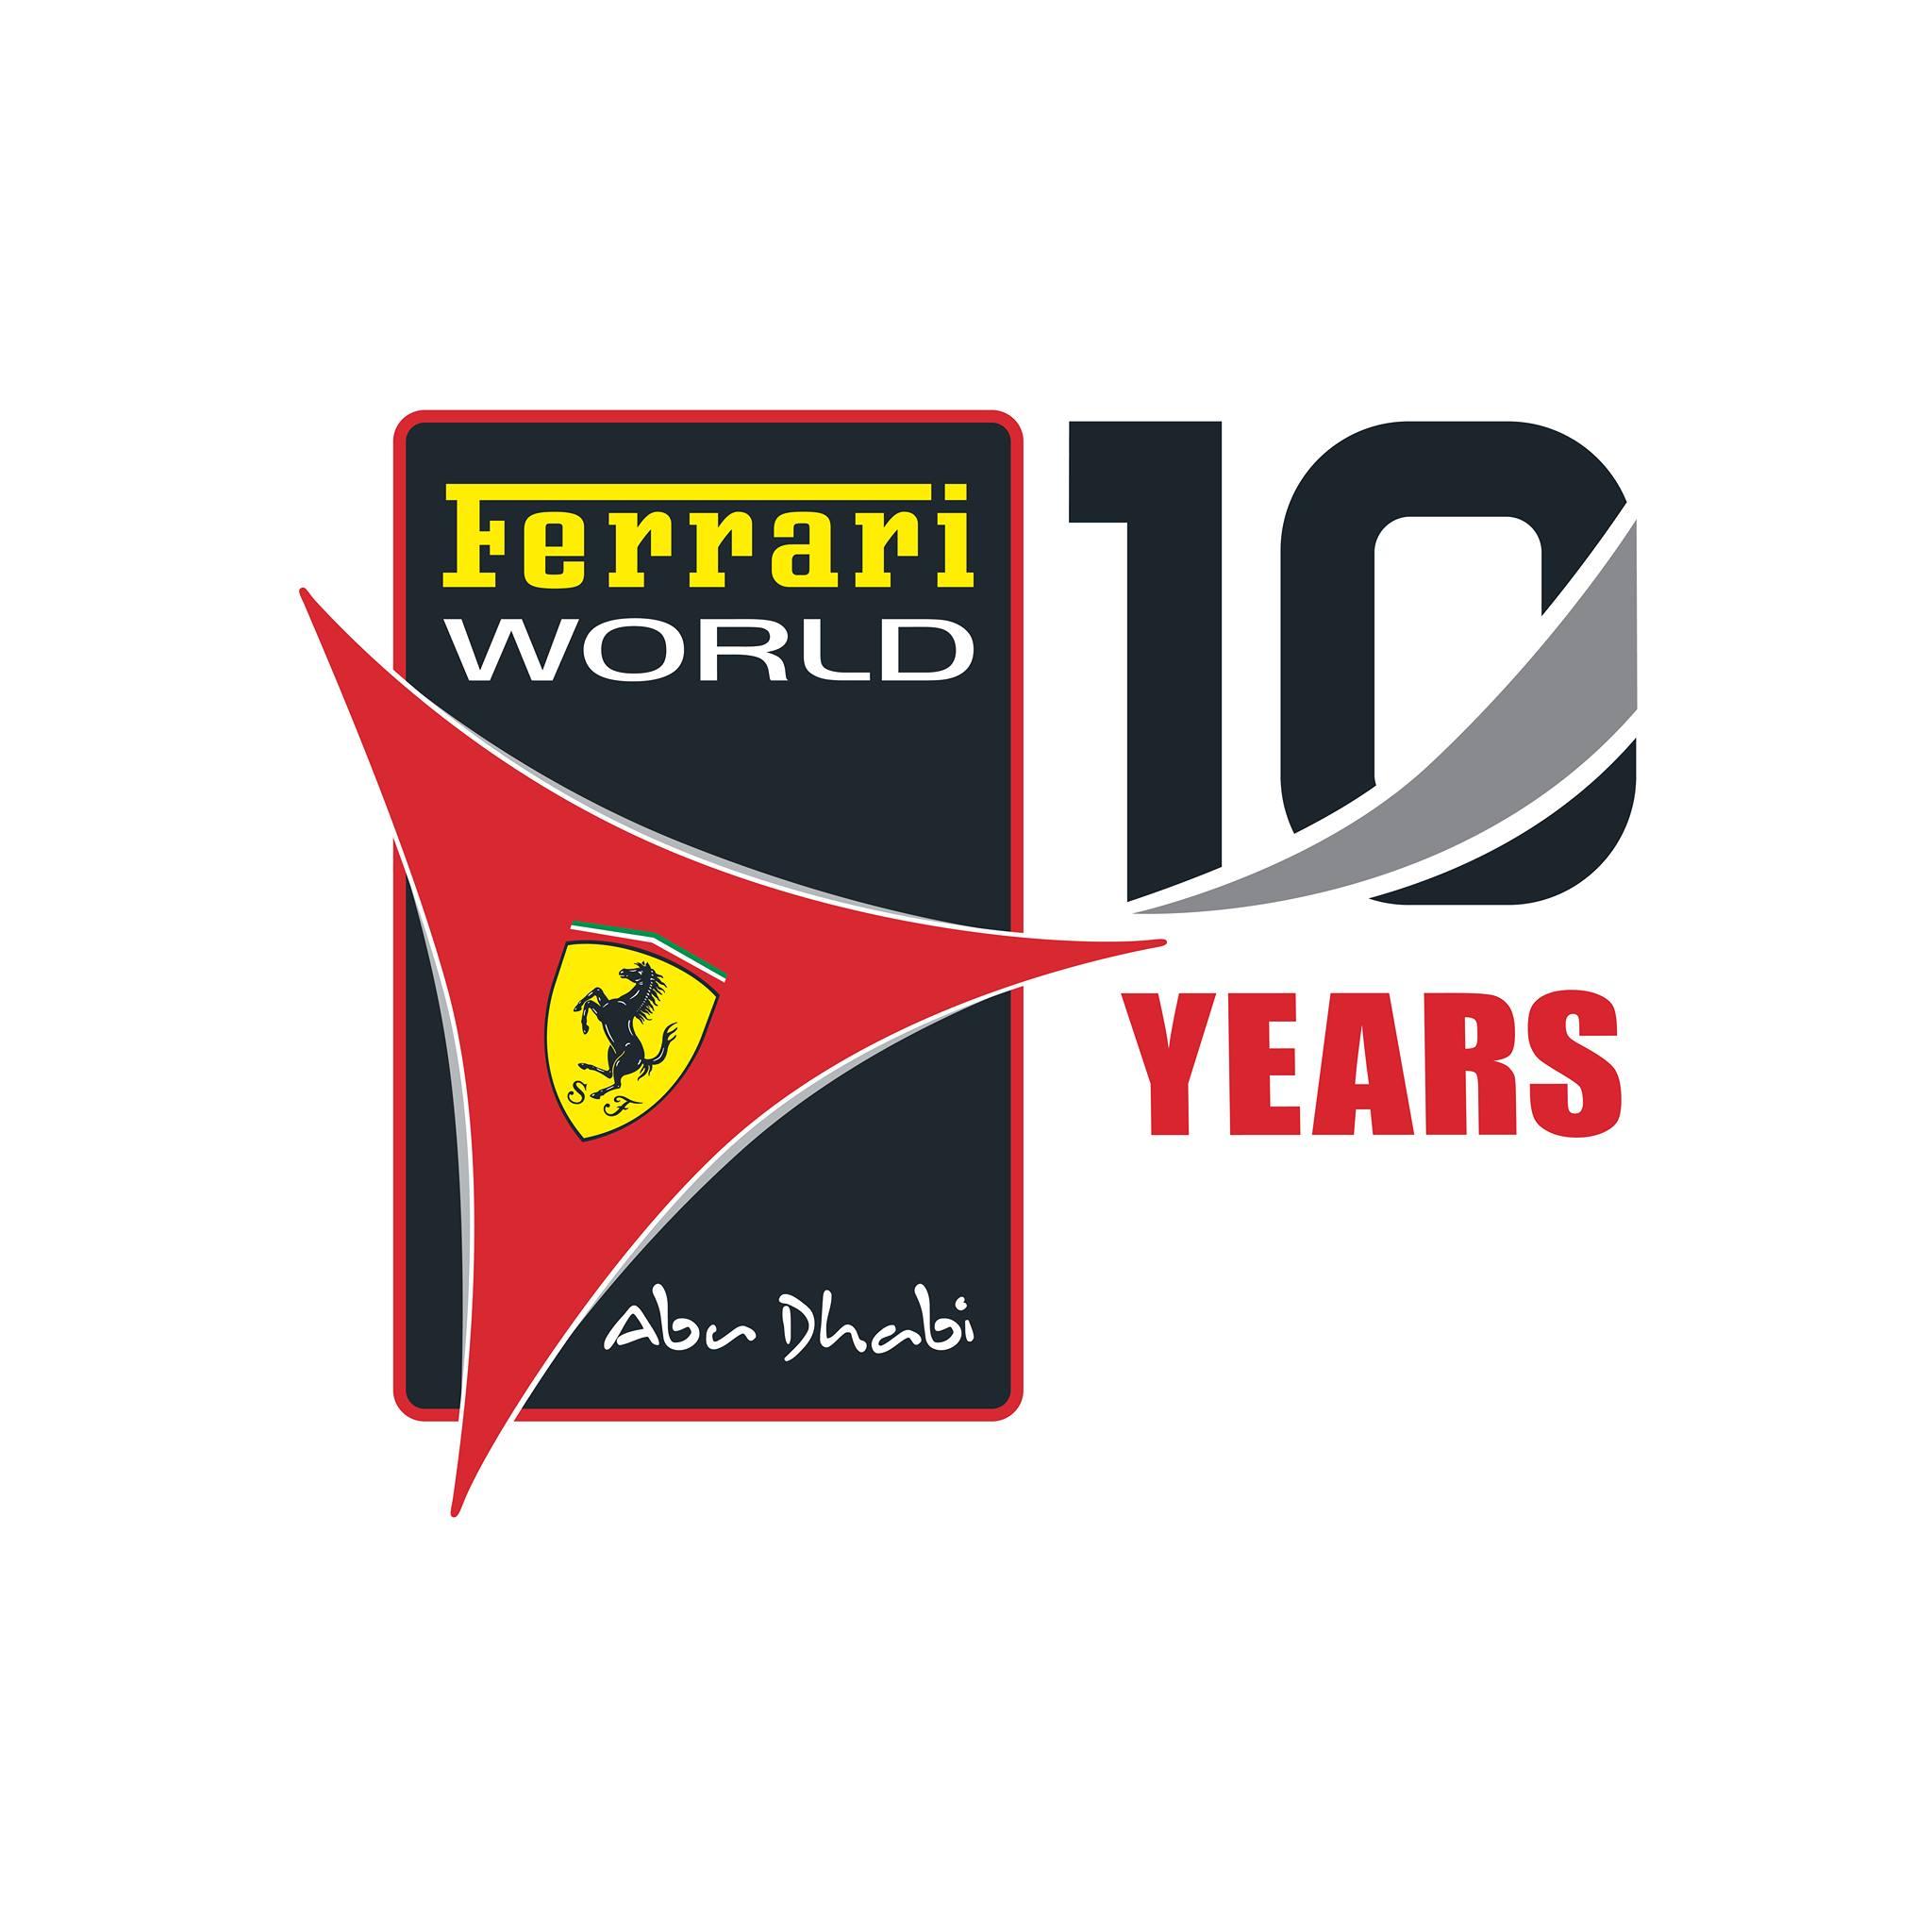 Ferrari World Abu Dhabi, United Arab Emirates